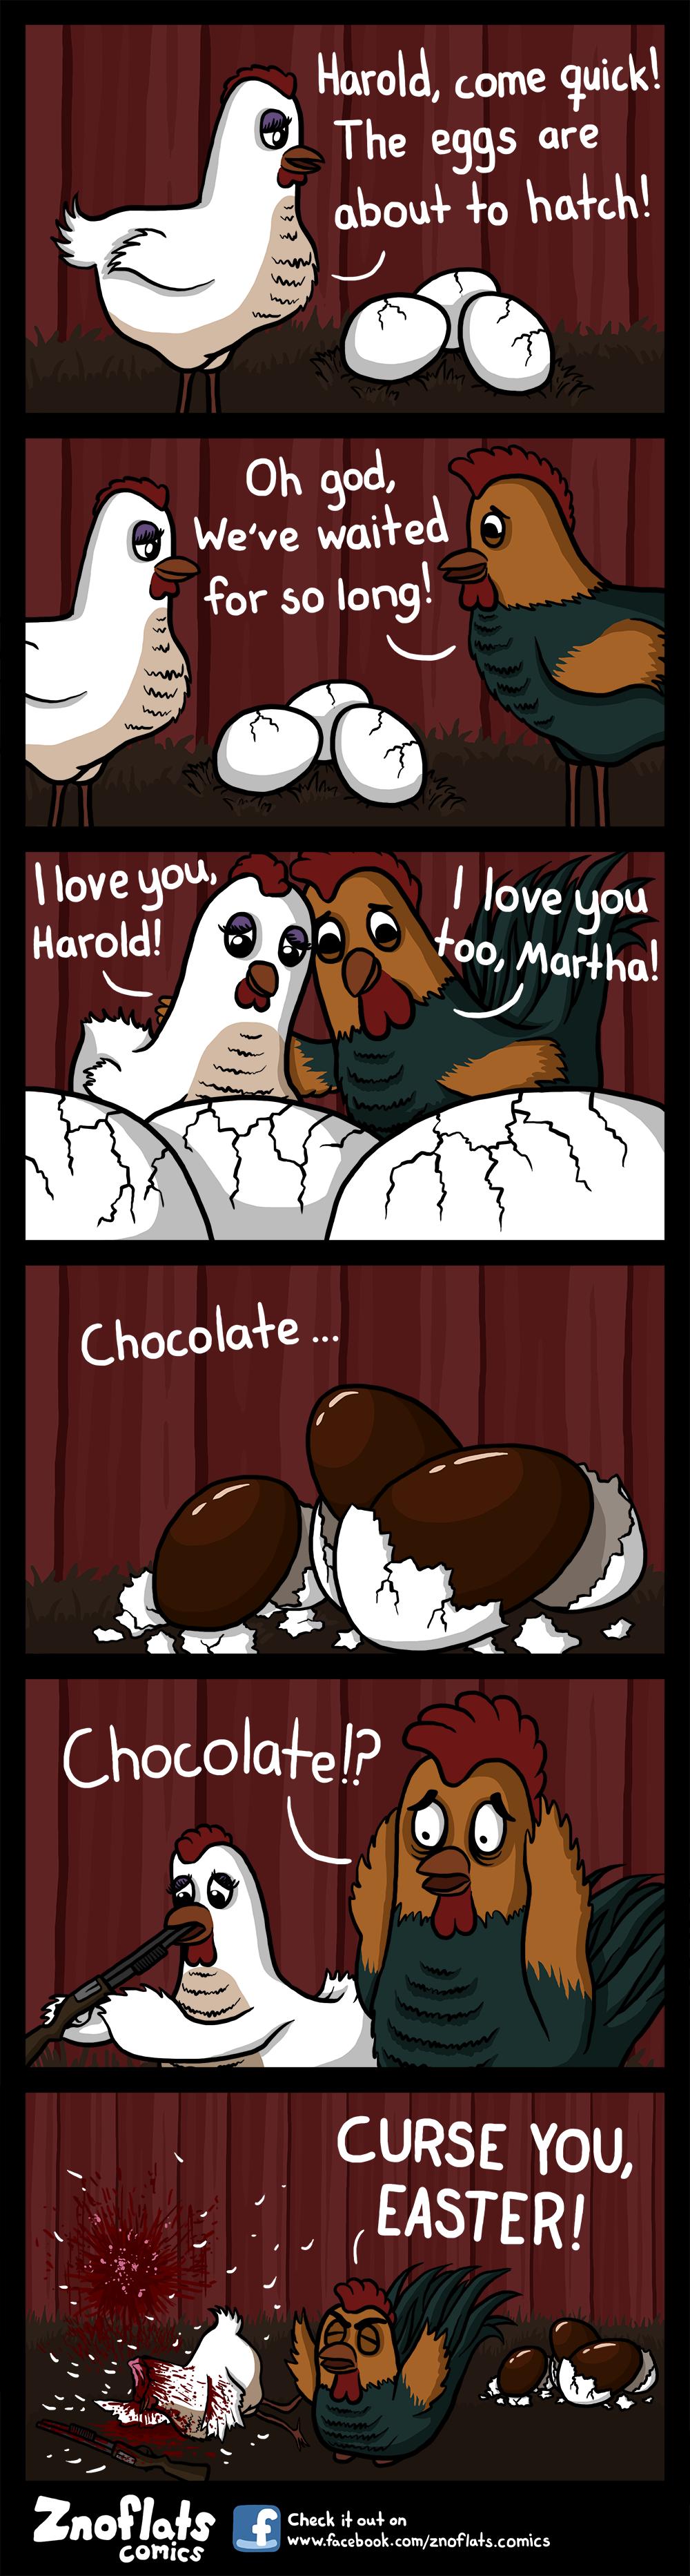 Godis är fan gött asså. A bit late easter comic for you guys to enjoy. Happy easter! www.facebook.com/Znoflats.Comics.. chocolate? chocolate?! CHOCOLATE?!?! Znoflats Easter Eggs chocolate nigger